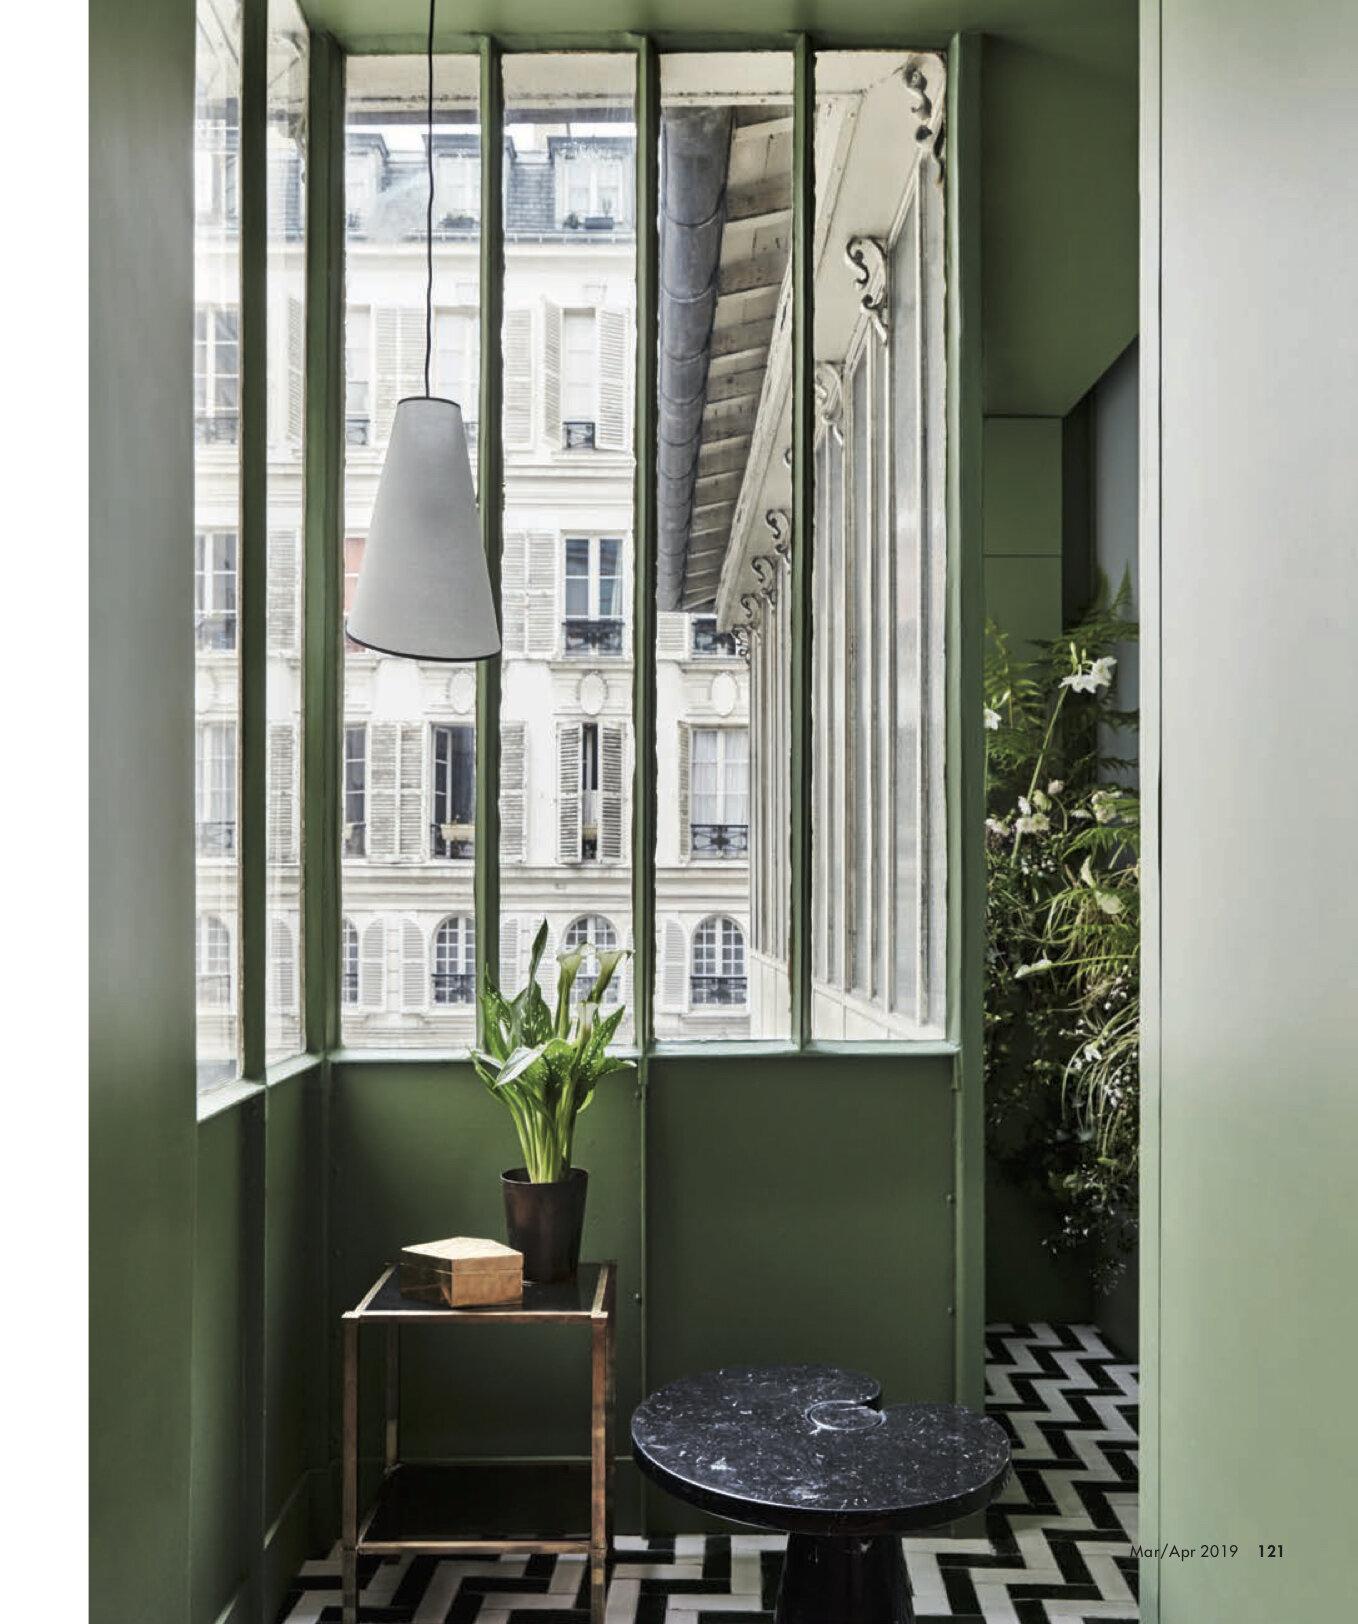 Studio Maddox Vogue Living - pg 122.jpg